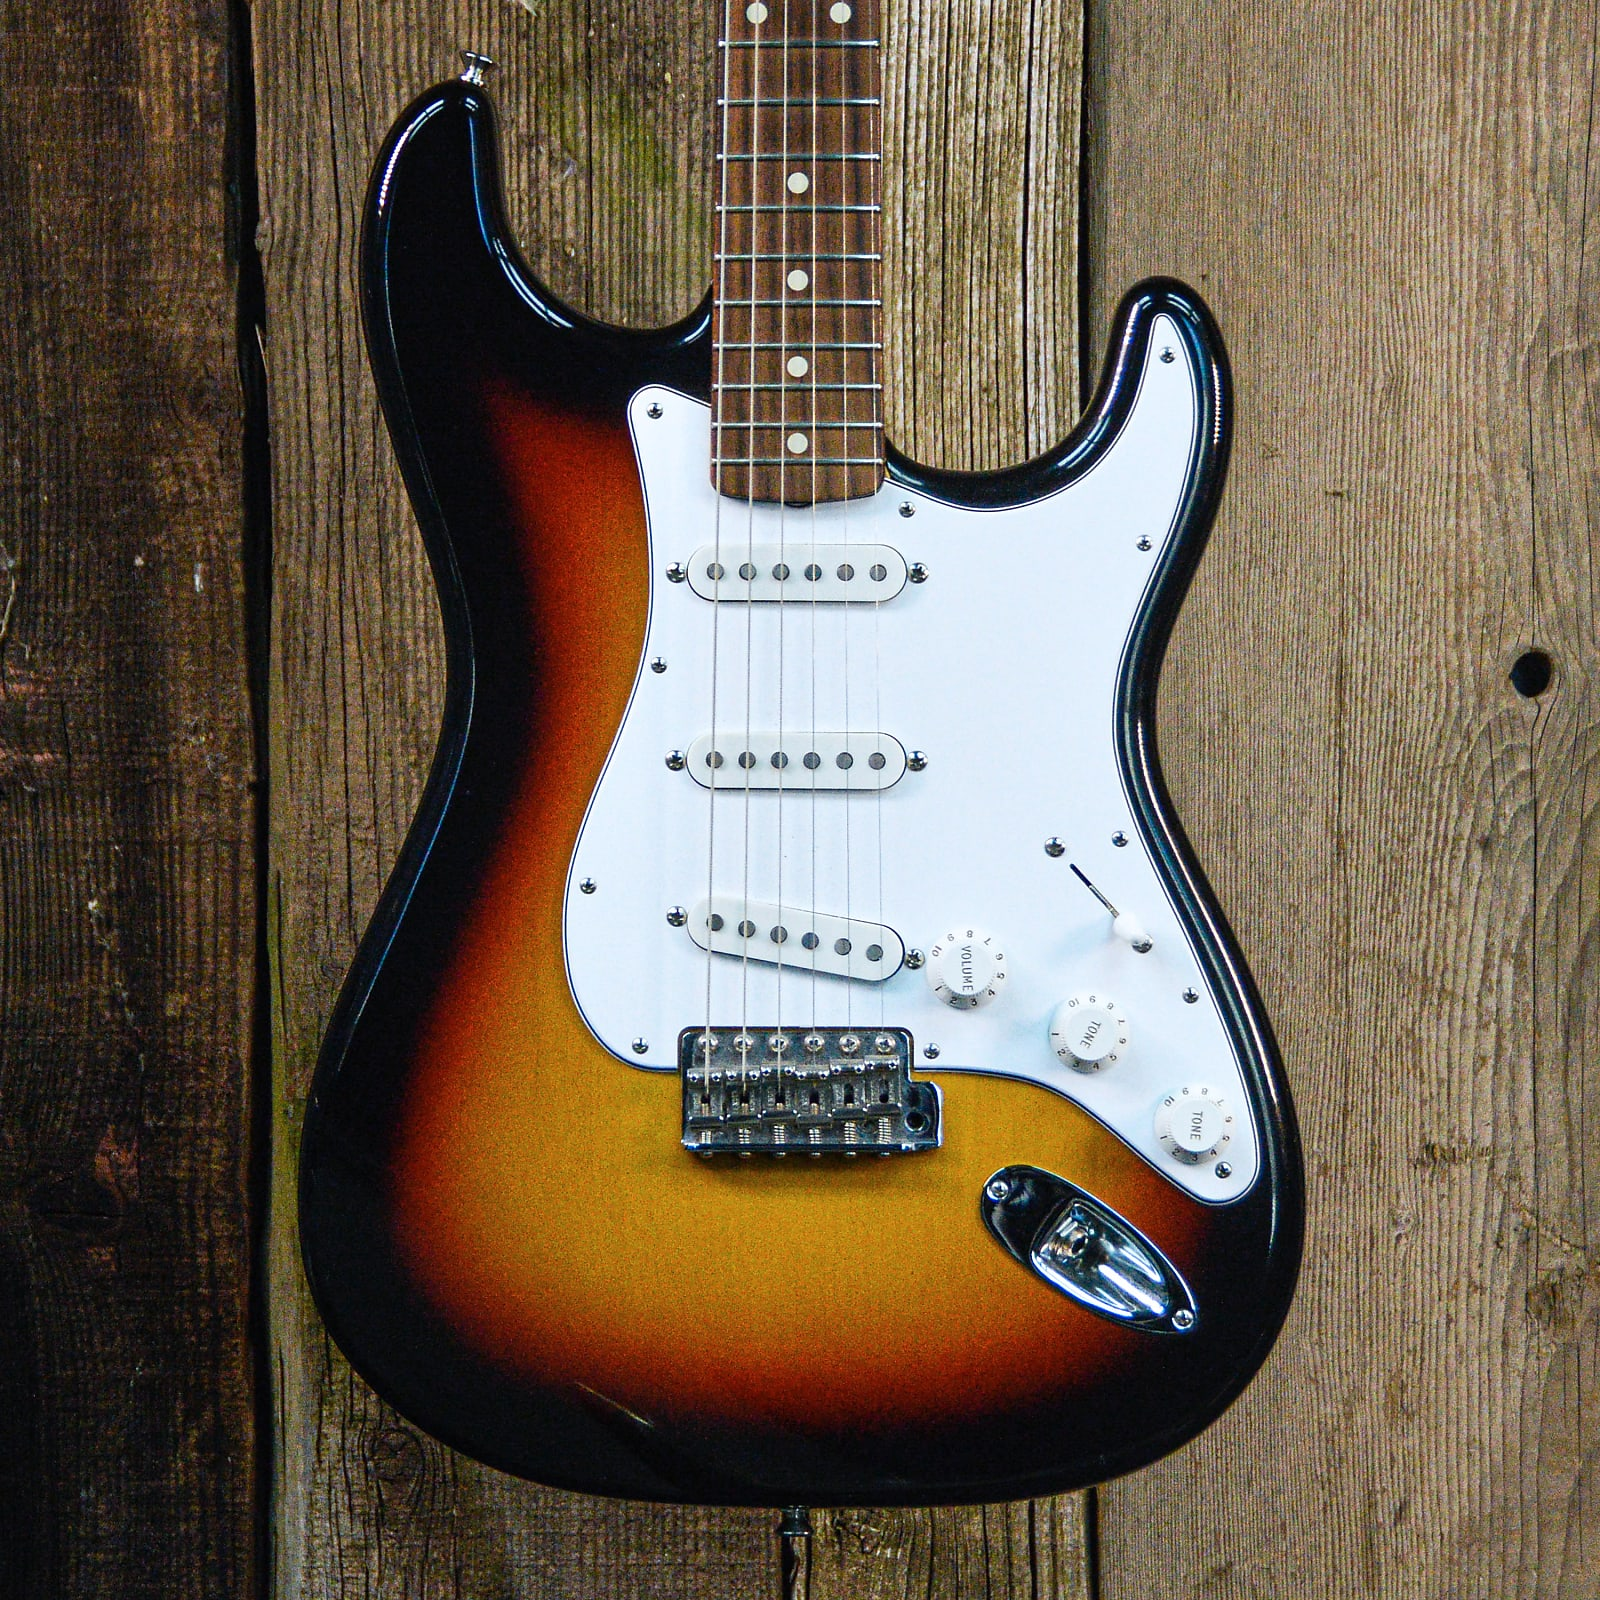 Fender Custom Shop 1960 Stratocaster NOS 2015 3-Tone Sunburst